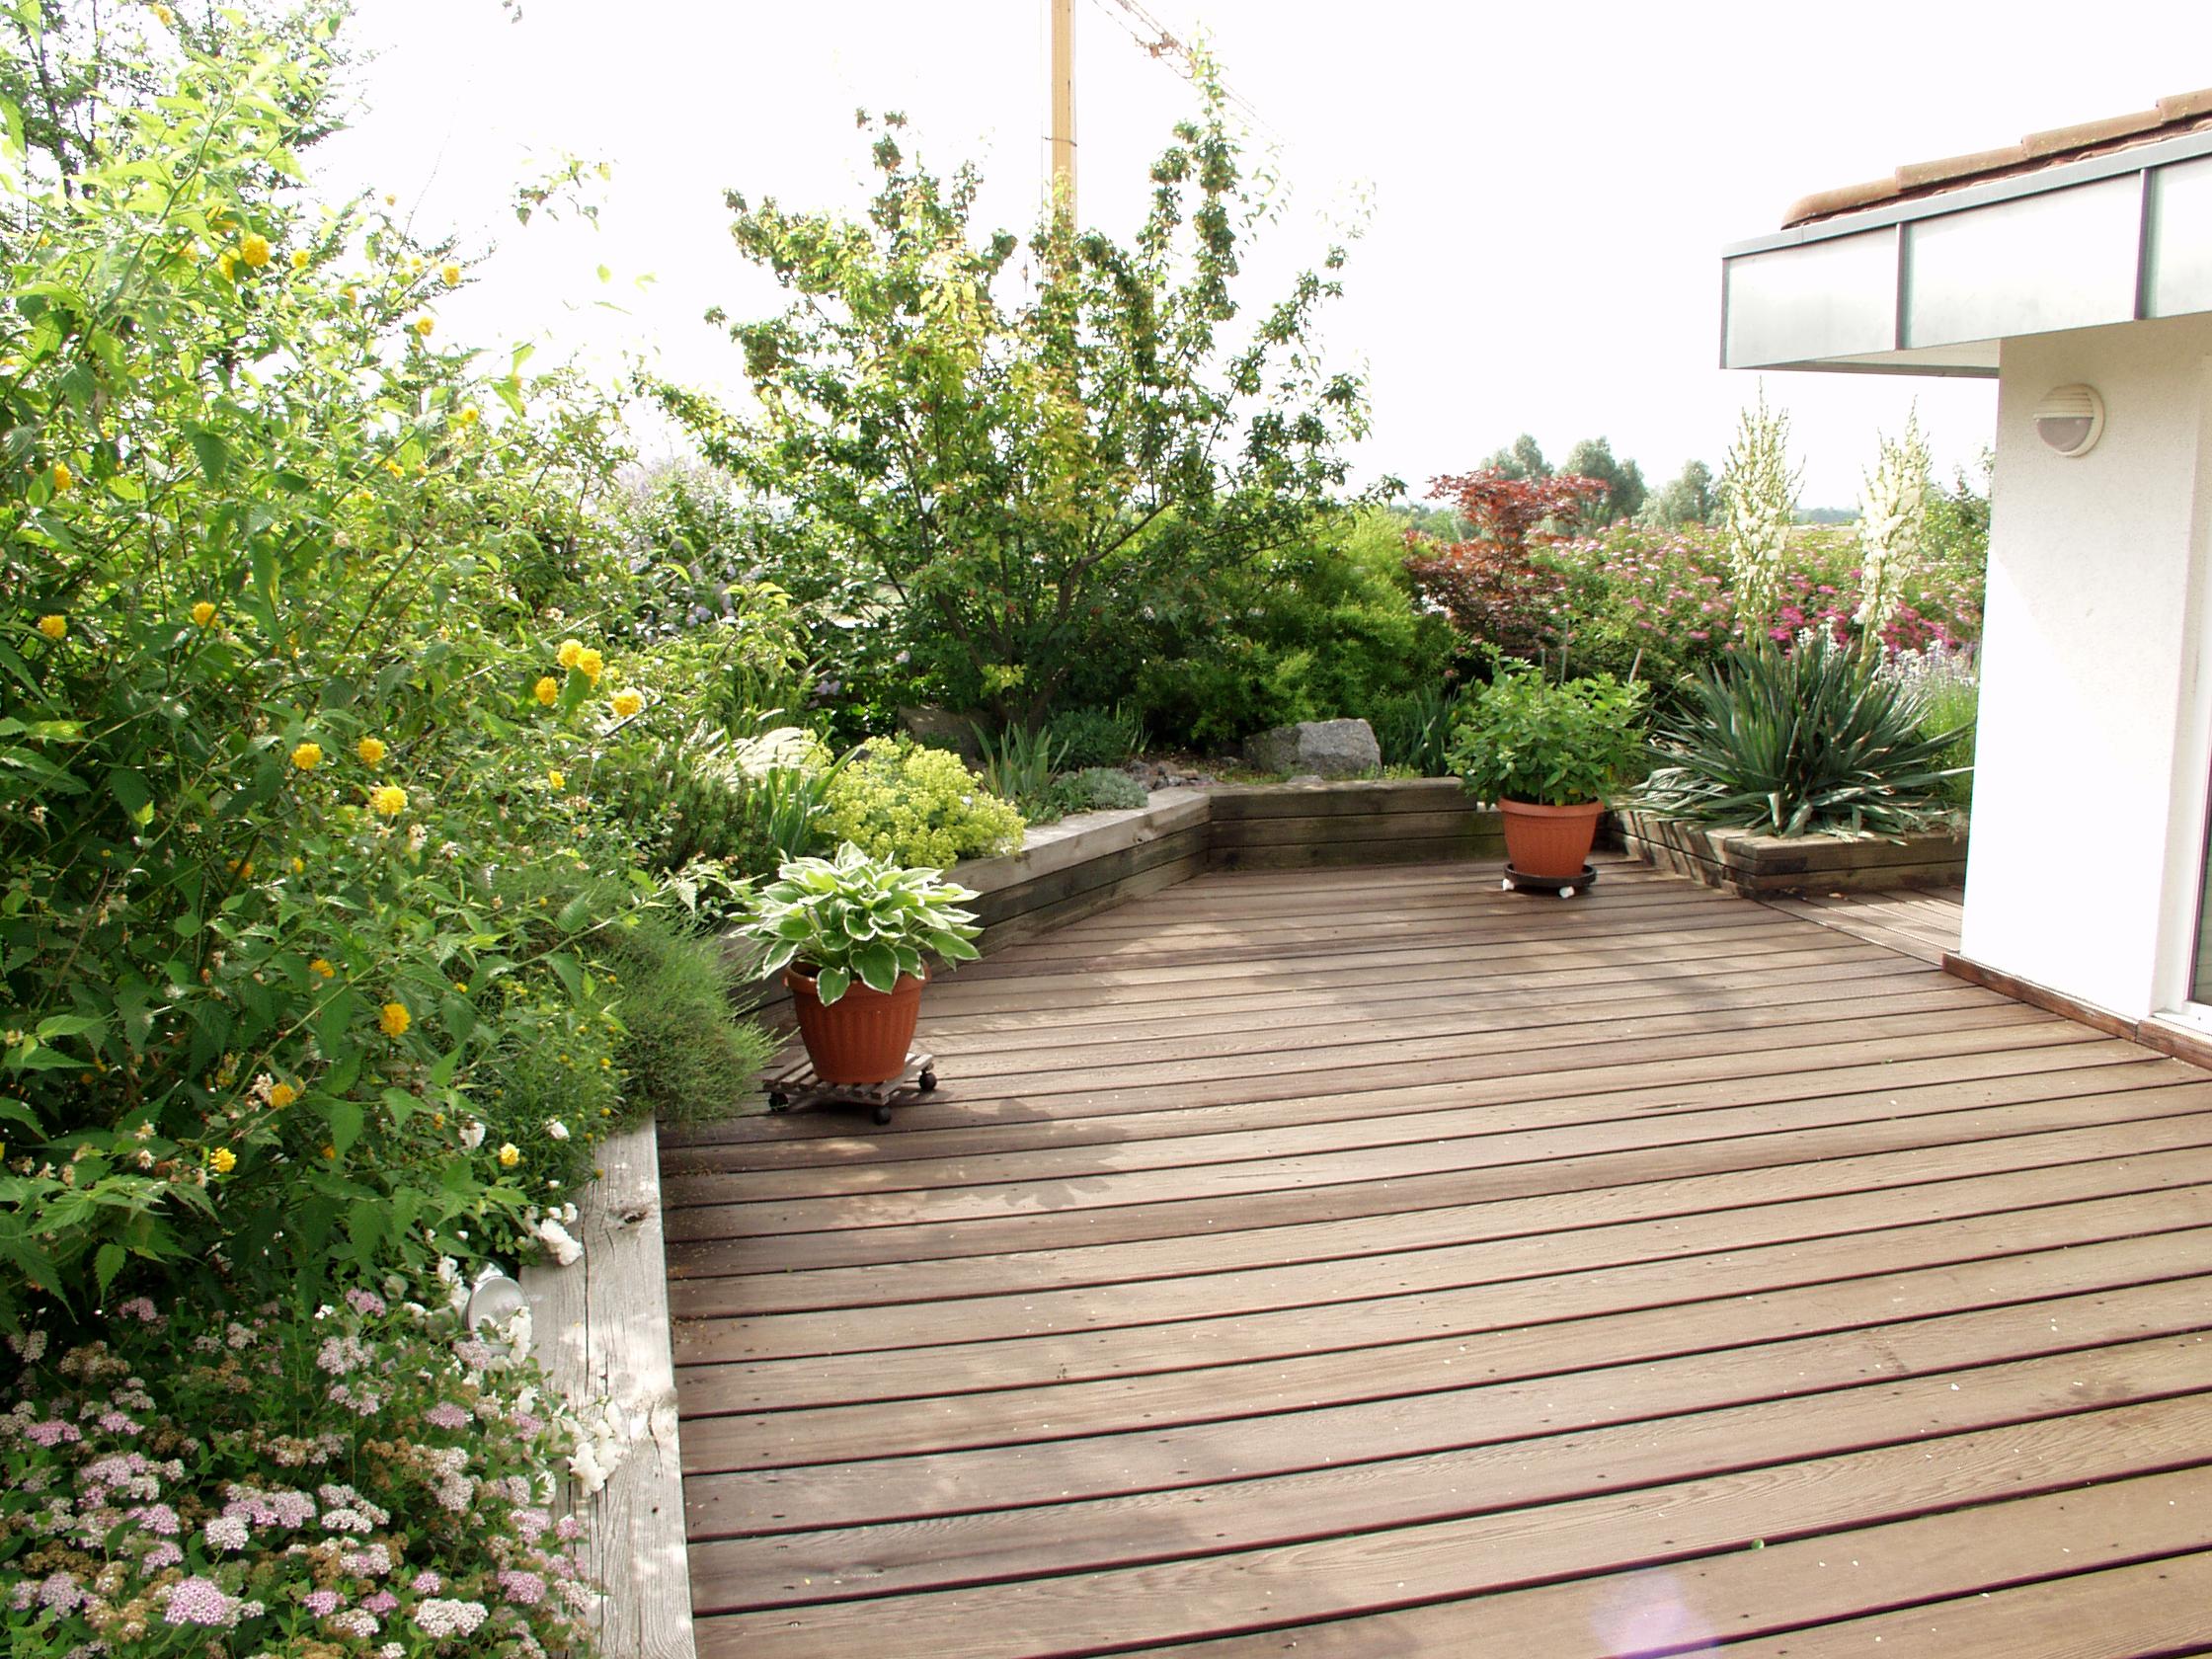 Acoperisuri cu vegetatie extensiva, intensiva BAUDER - Poza 38